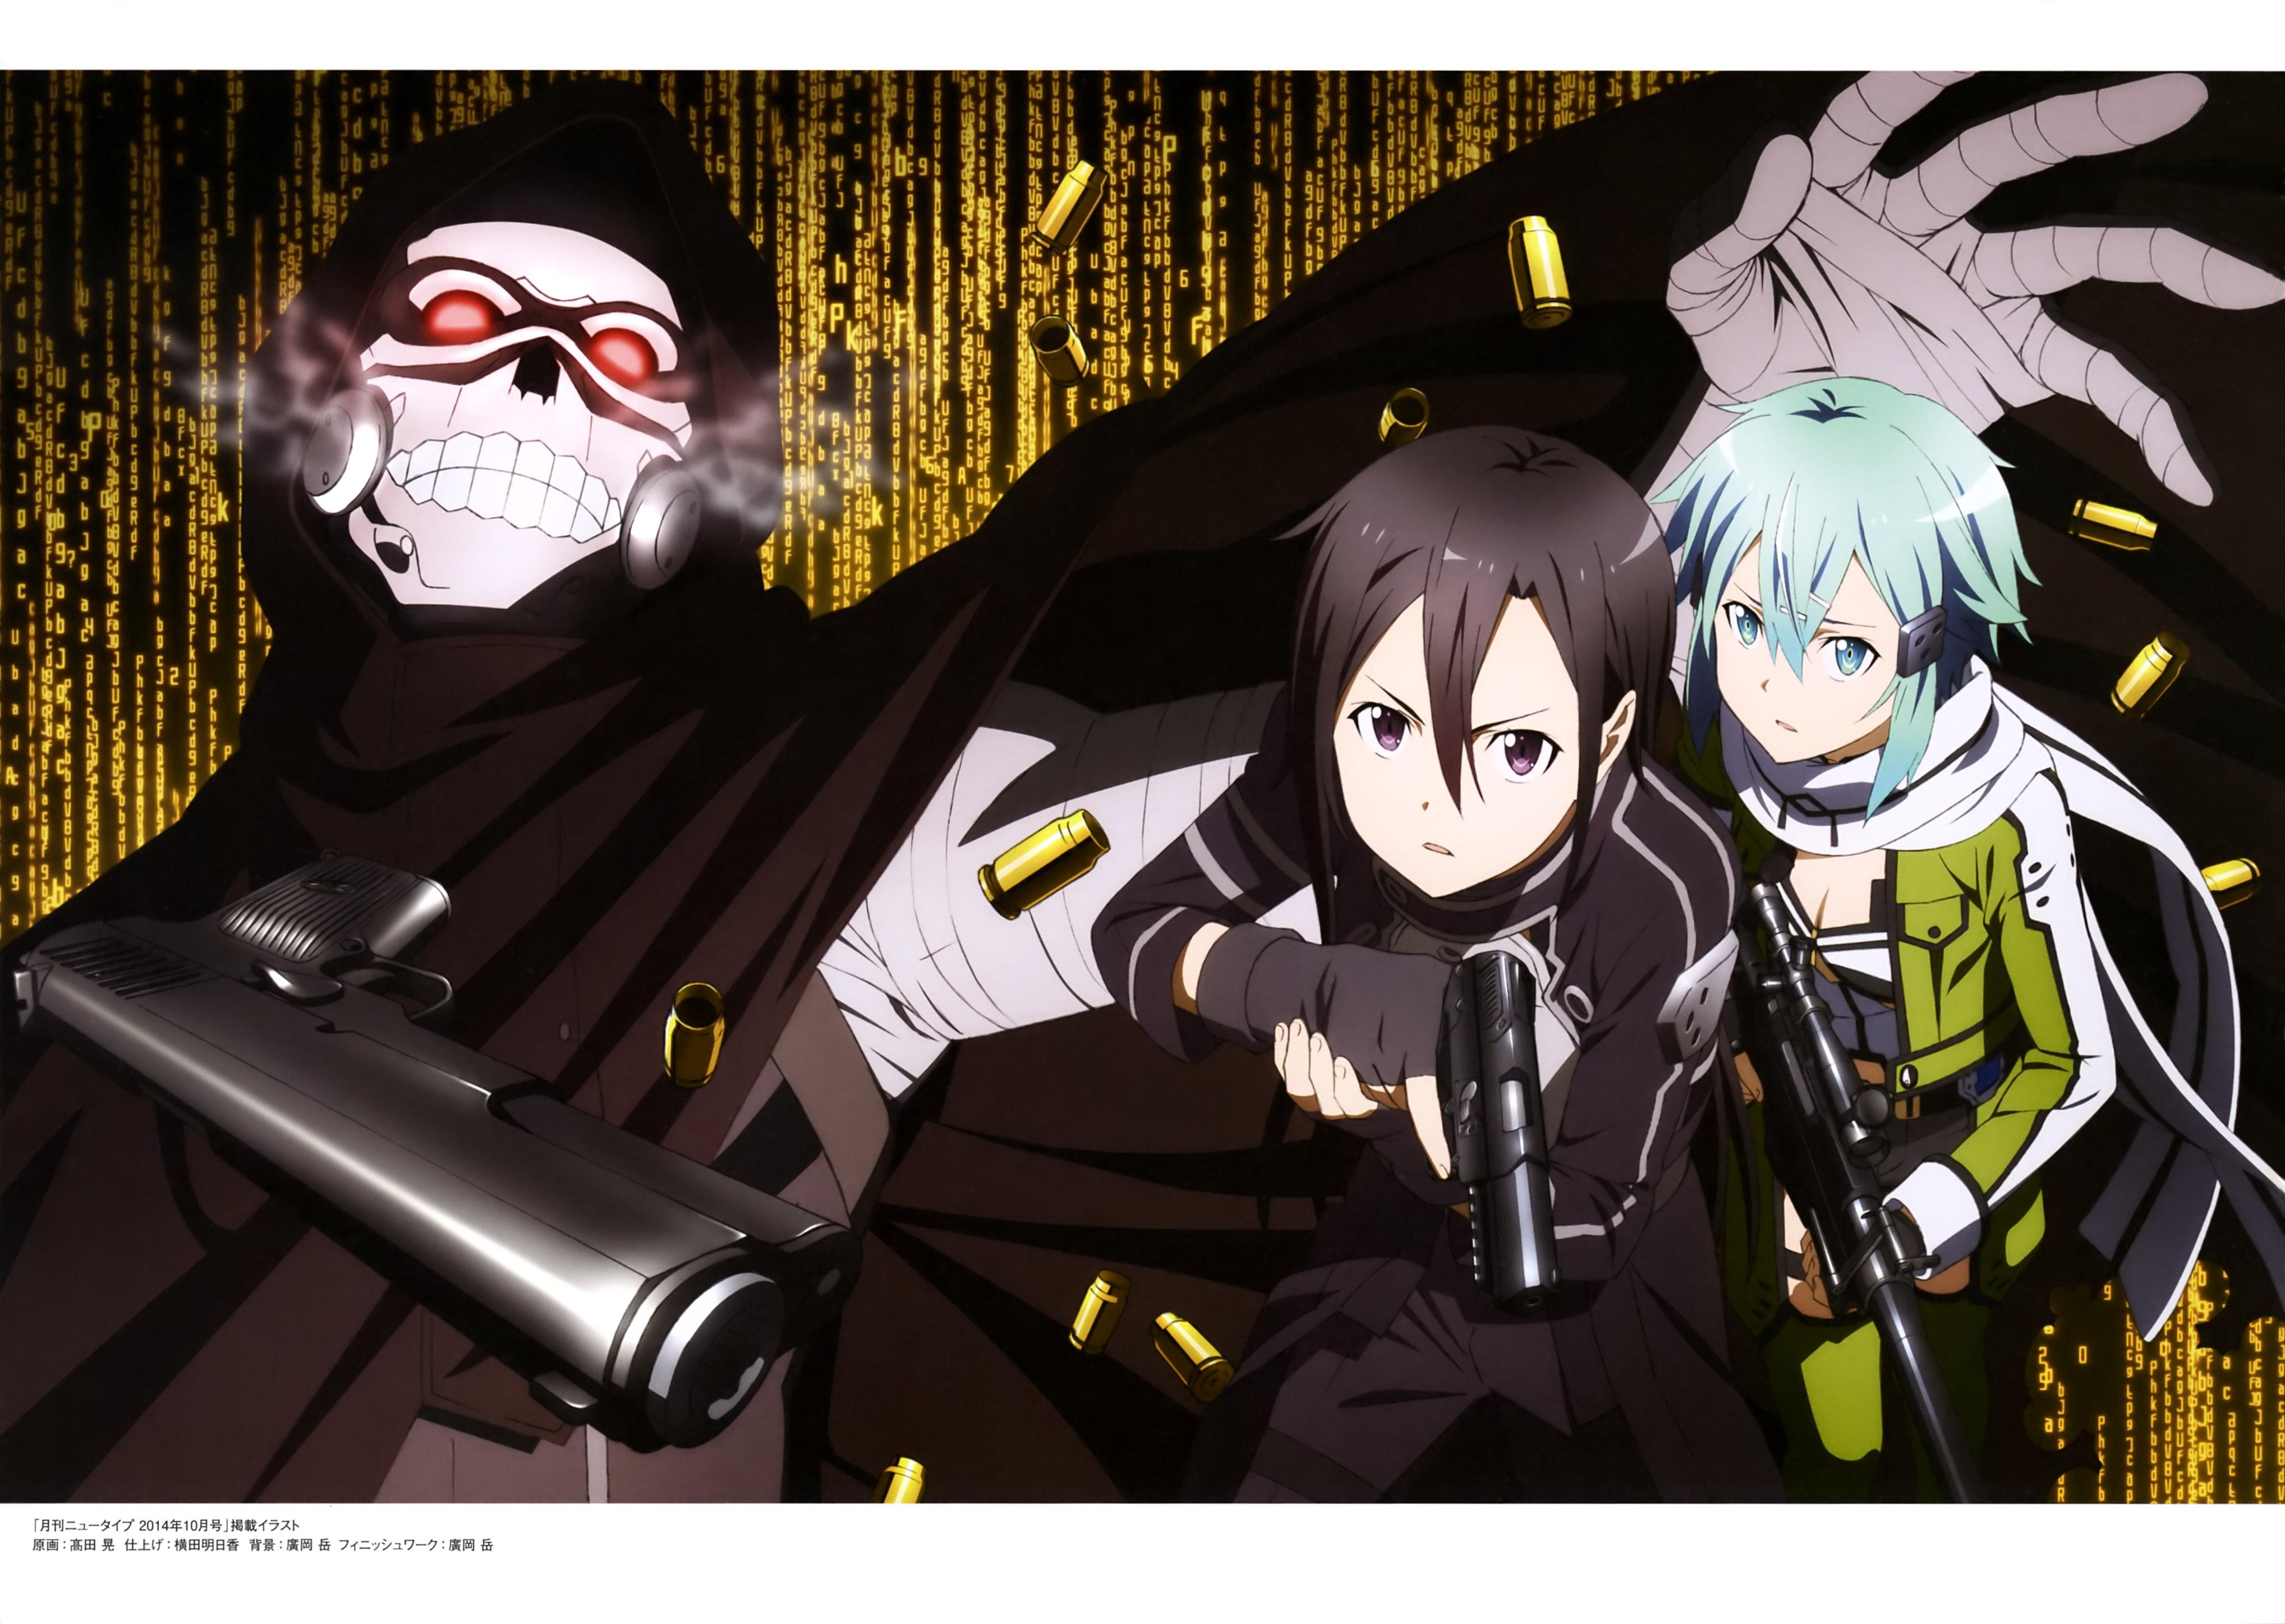 Death Gun Kirito And Sinon Sword Art Online Drawn By